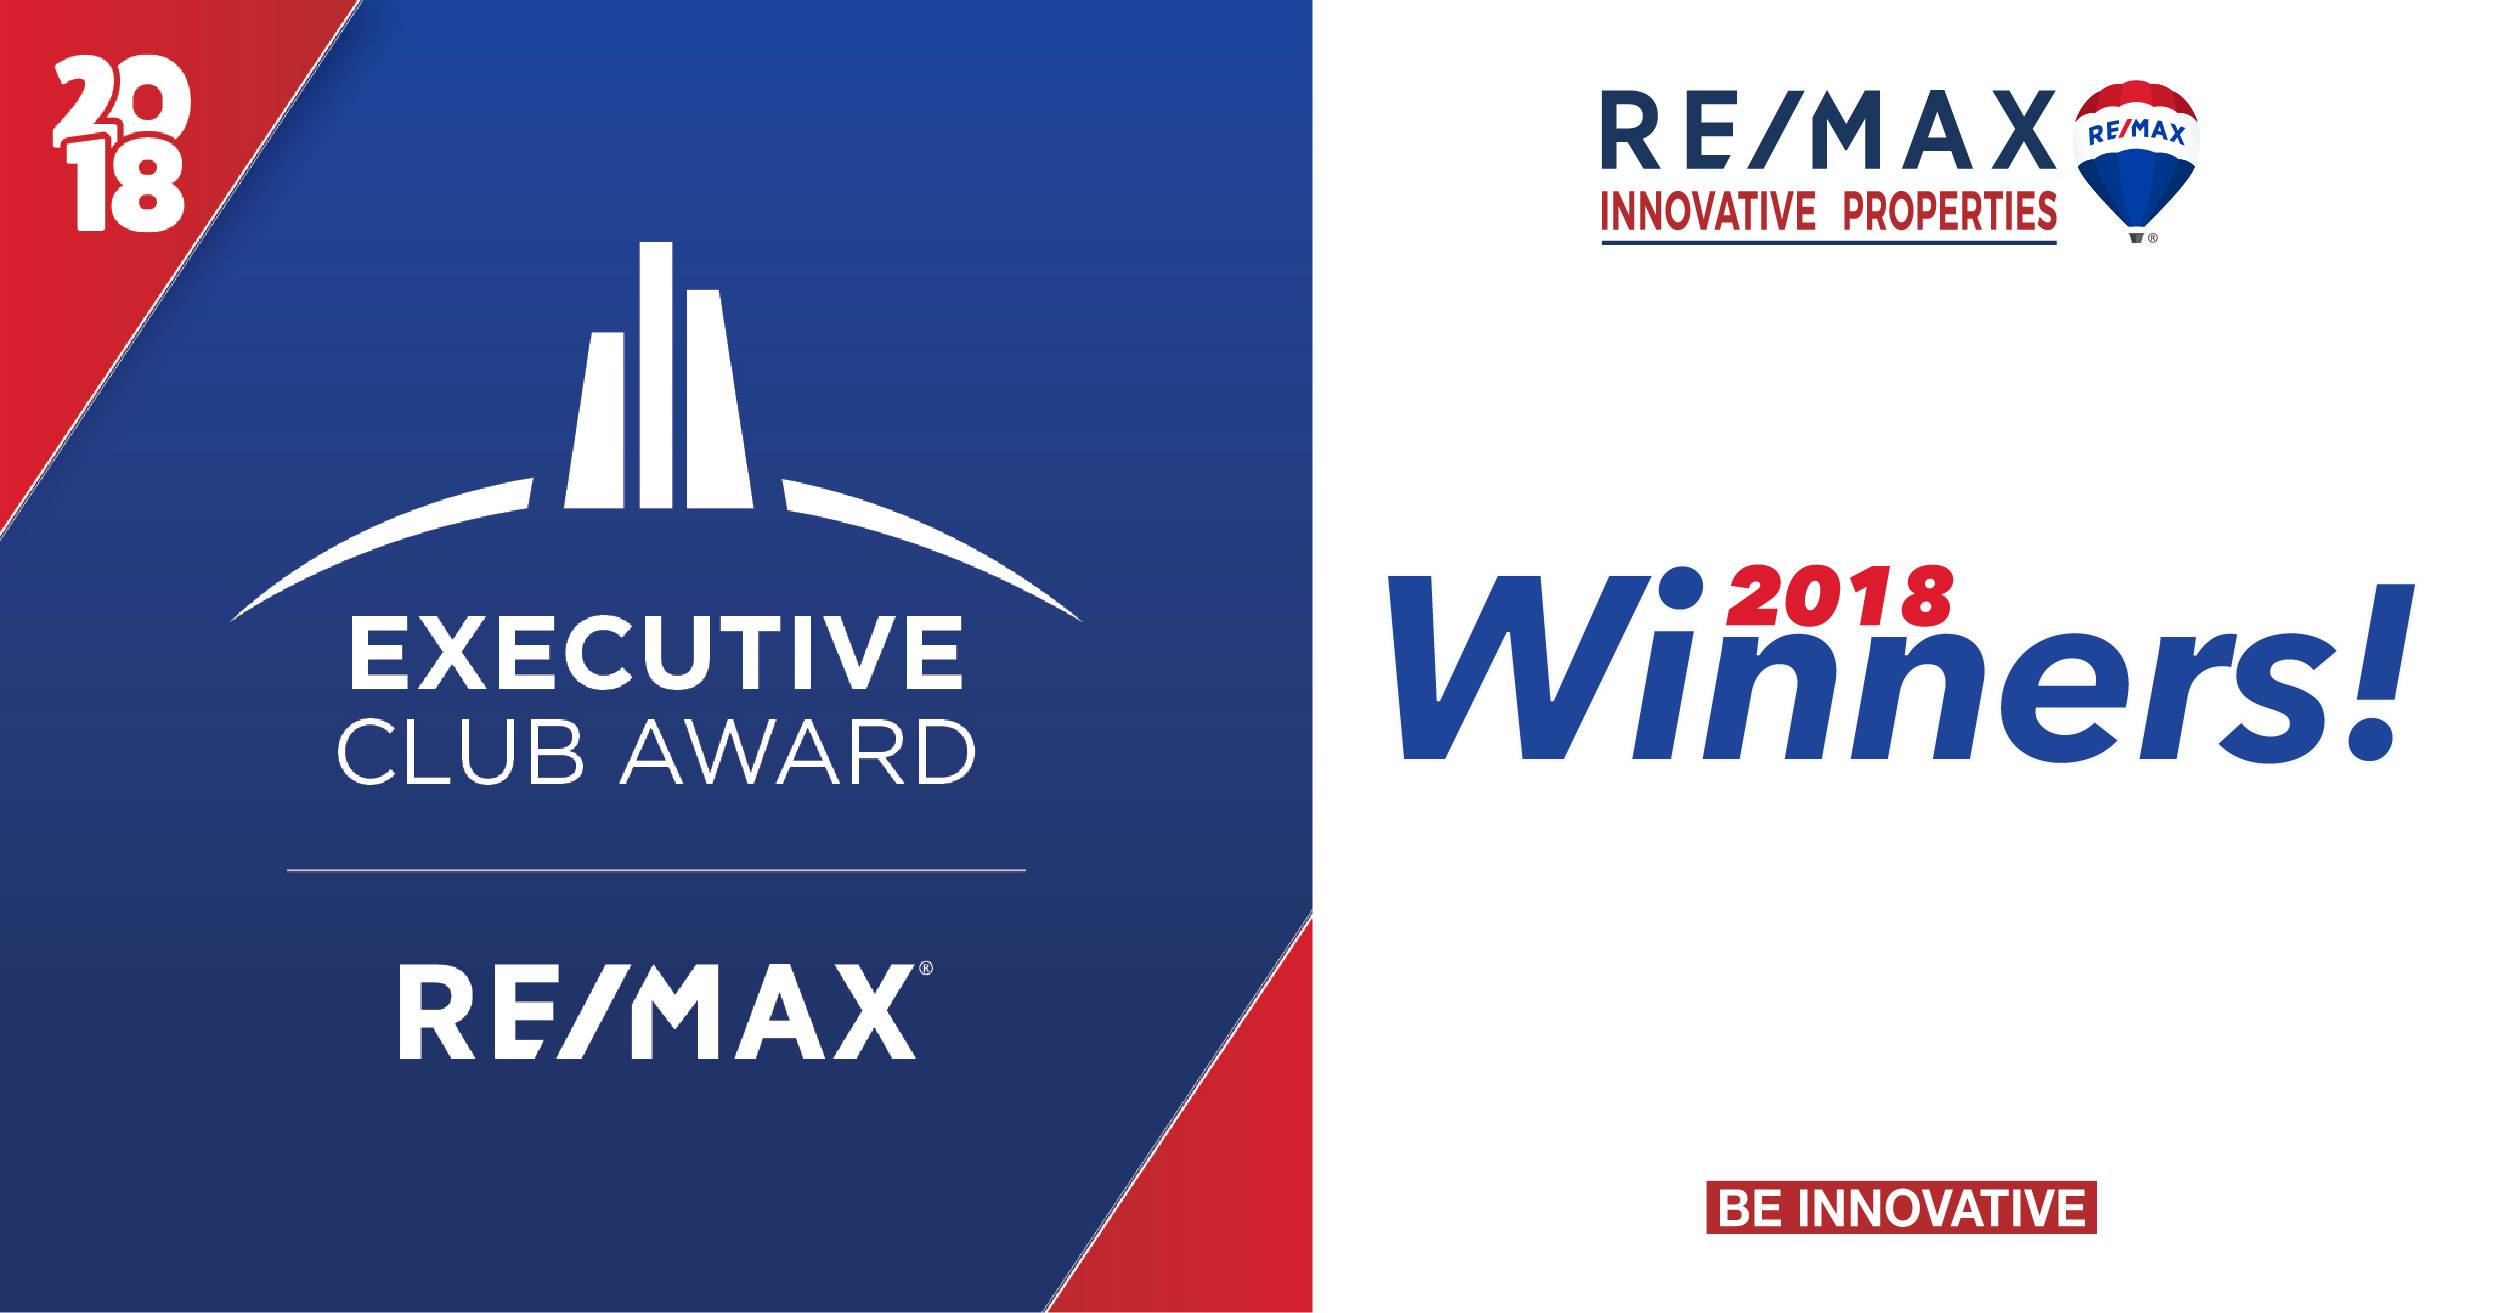 RE/MAX Innovative Properties Executive Club Award